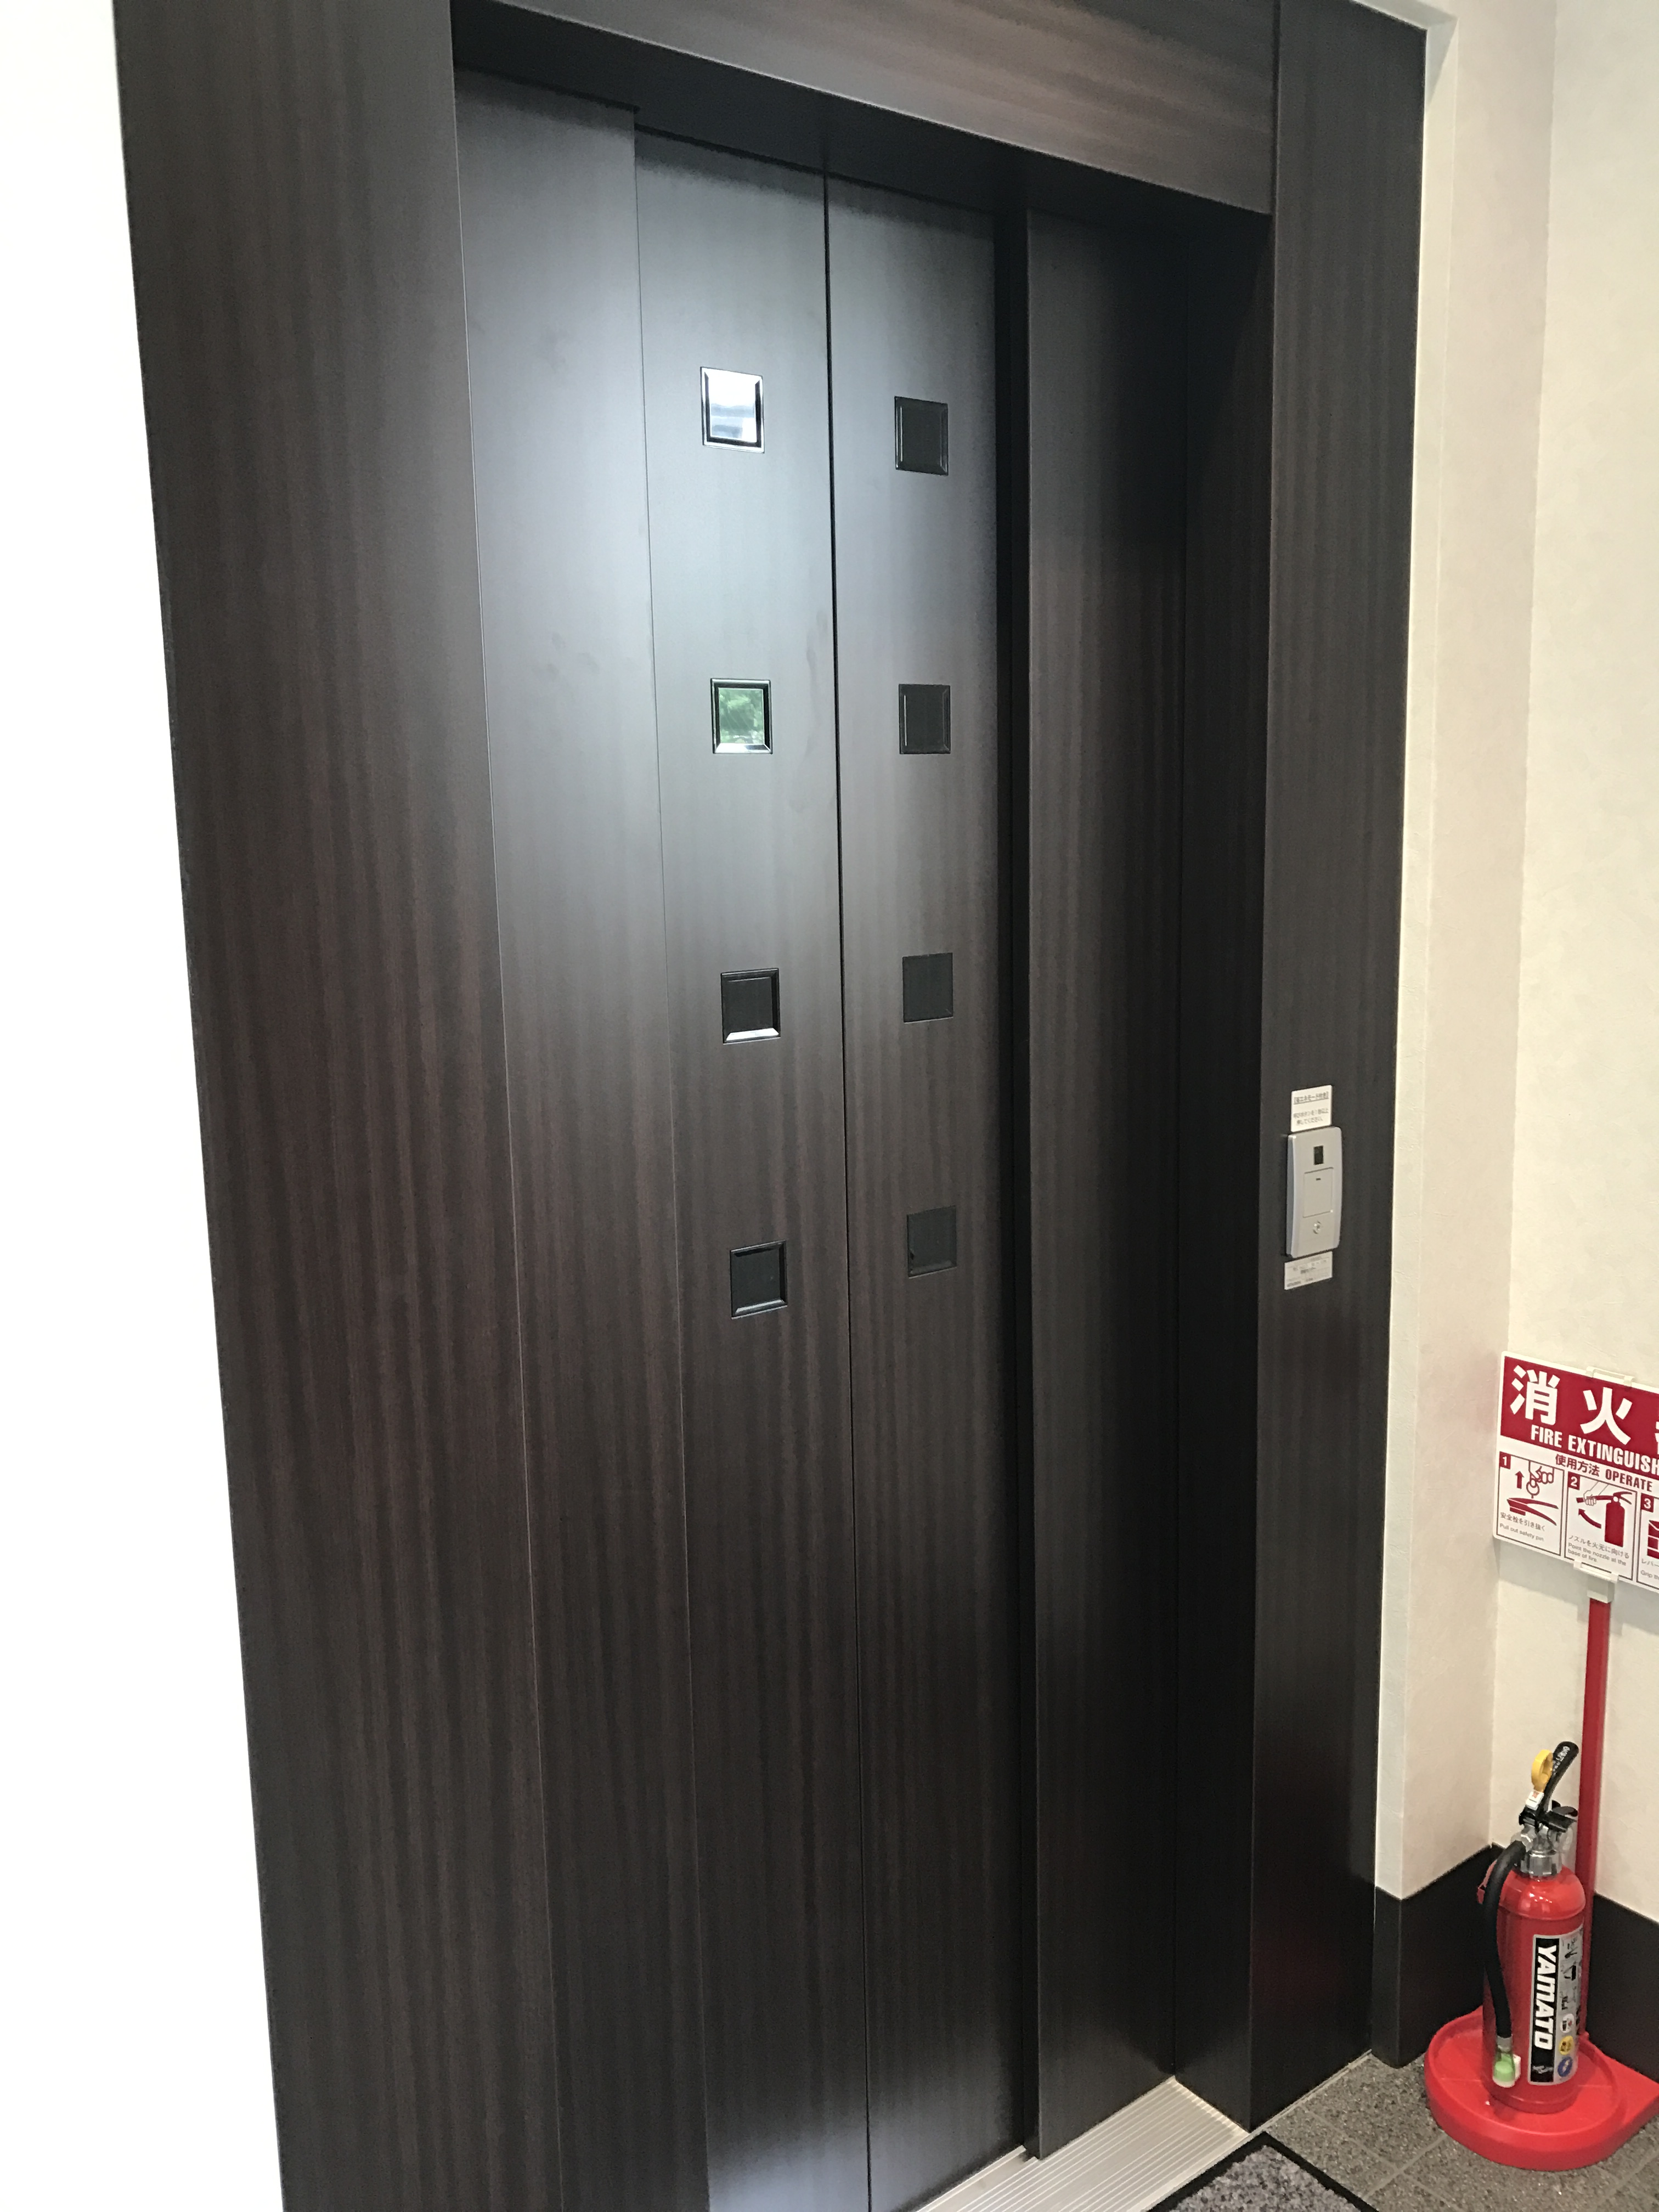 「INABA96」練馬氷川台店 エレベーター 最大積載量:200kg [開口寸法] 間口0.80m 高さ1.90m [内寸] 間口0.95m 奥行1.10m 高さ1.90m